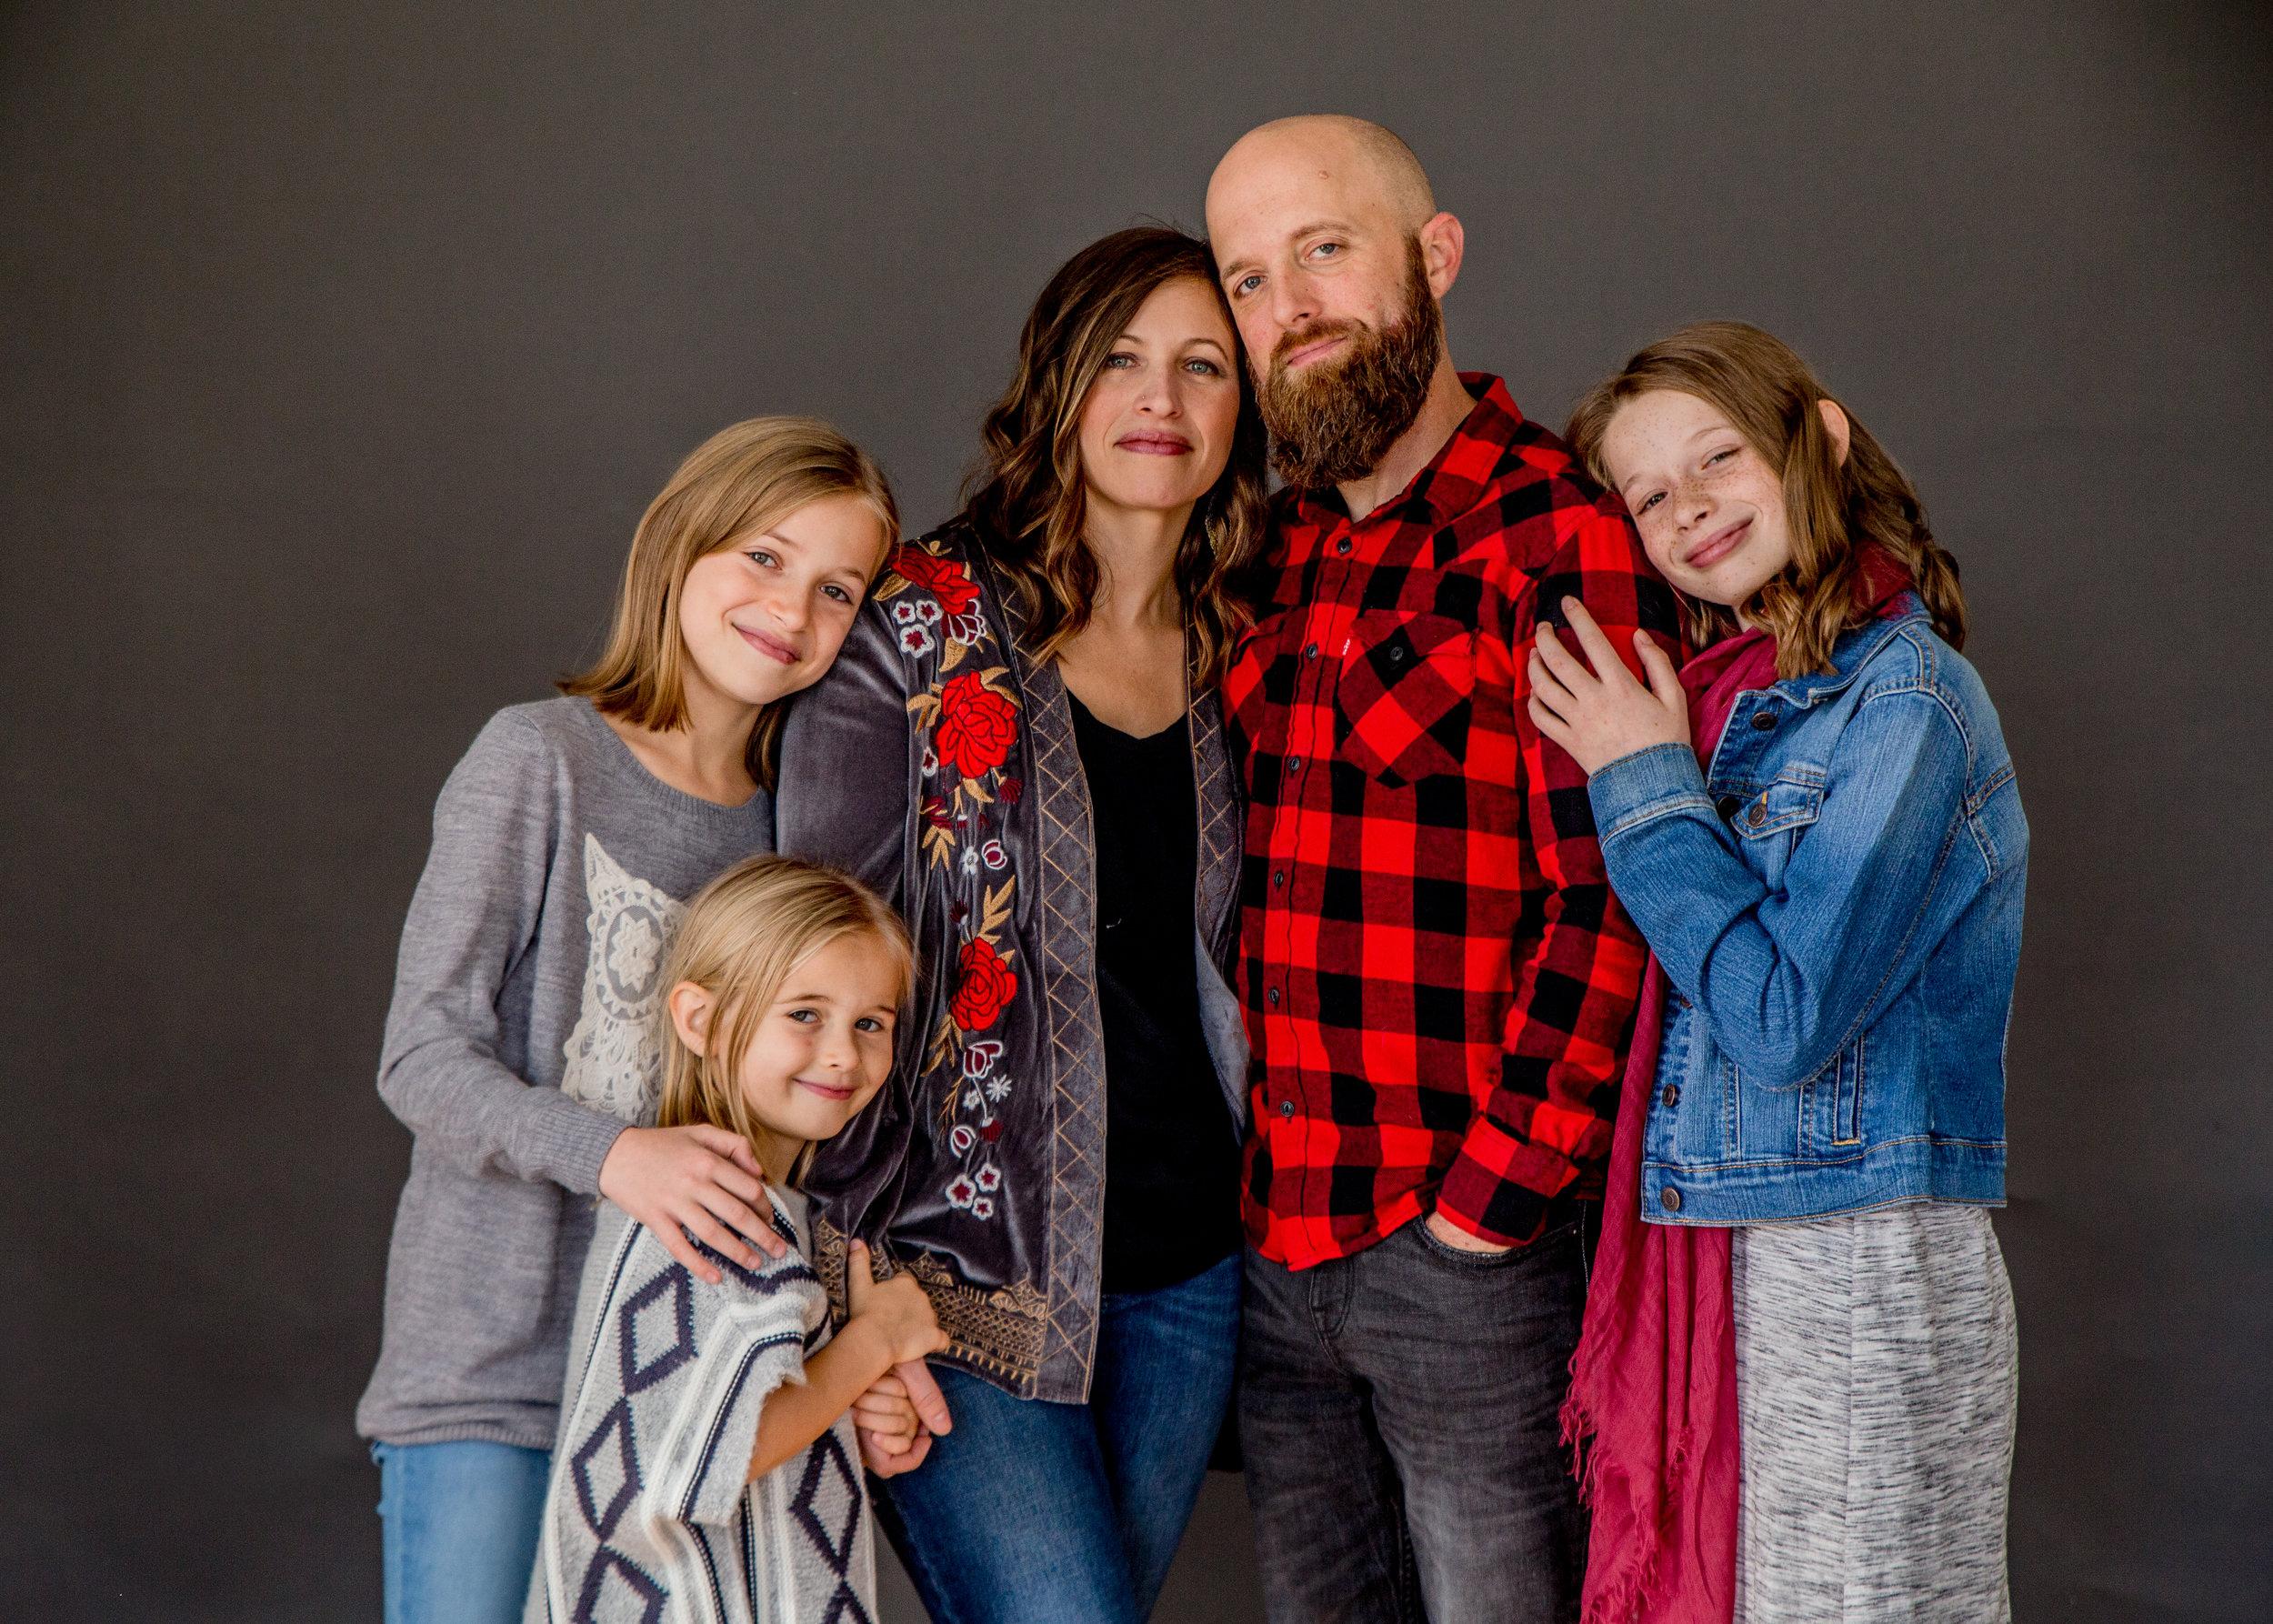 standrodfamily2018-37.jpg